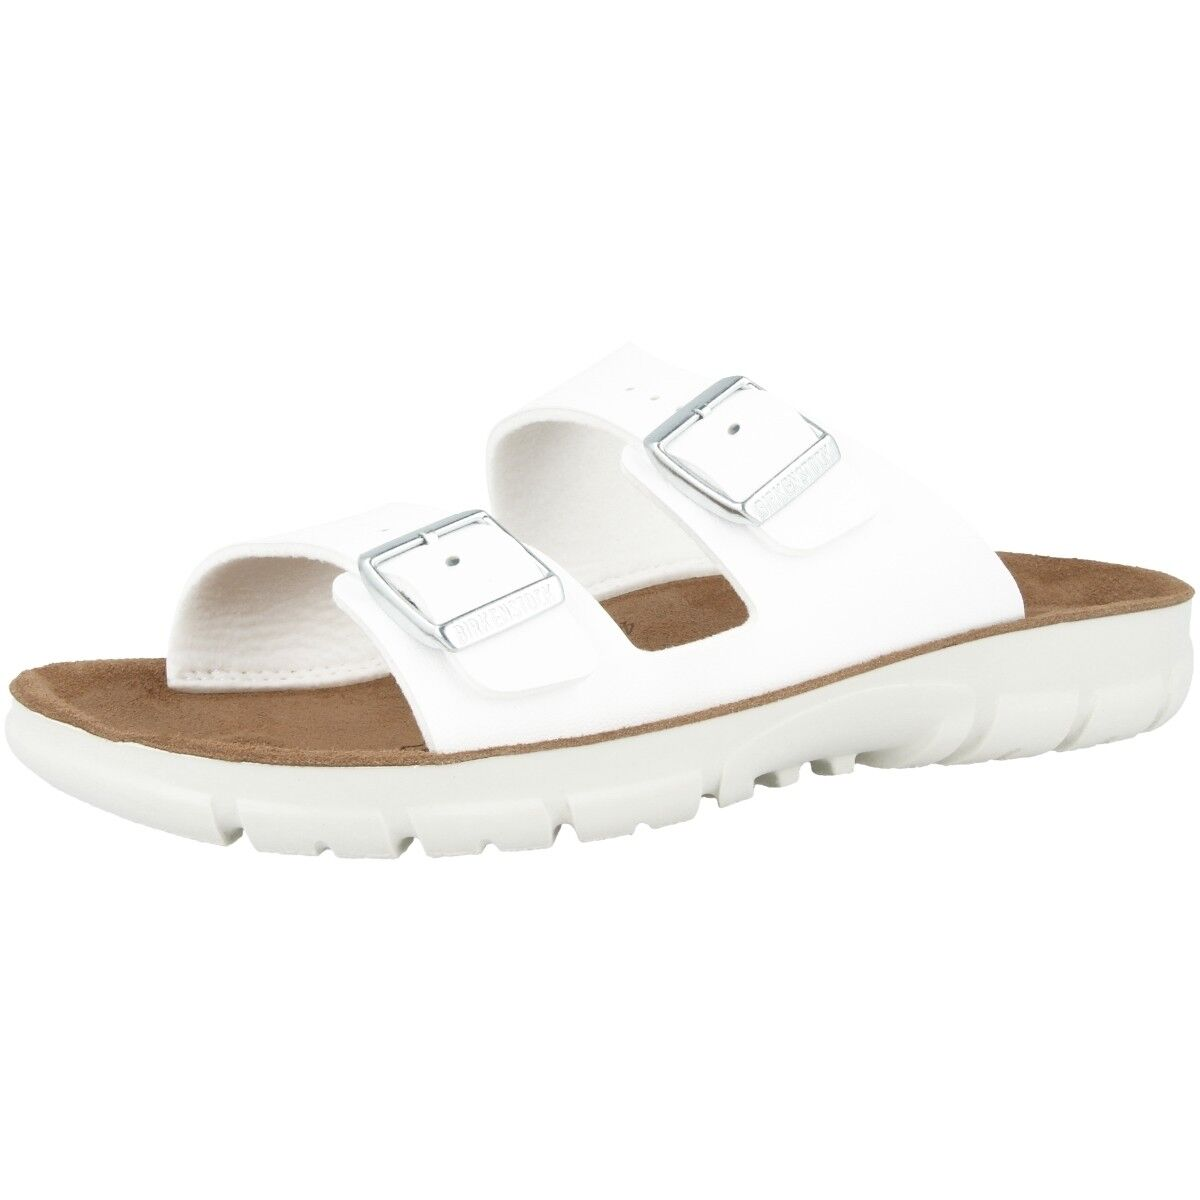 Birkenstock Sandale Bilbao Birko-Flor Weichbettung Schuhe Sandale Birkenstock 520781 Weite normal 1b77dd